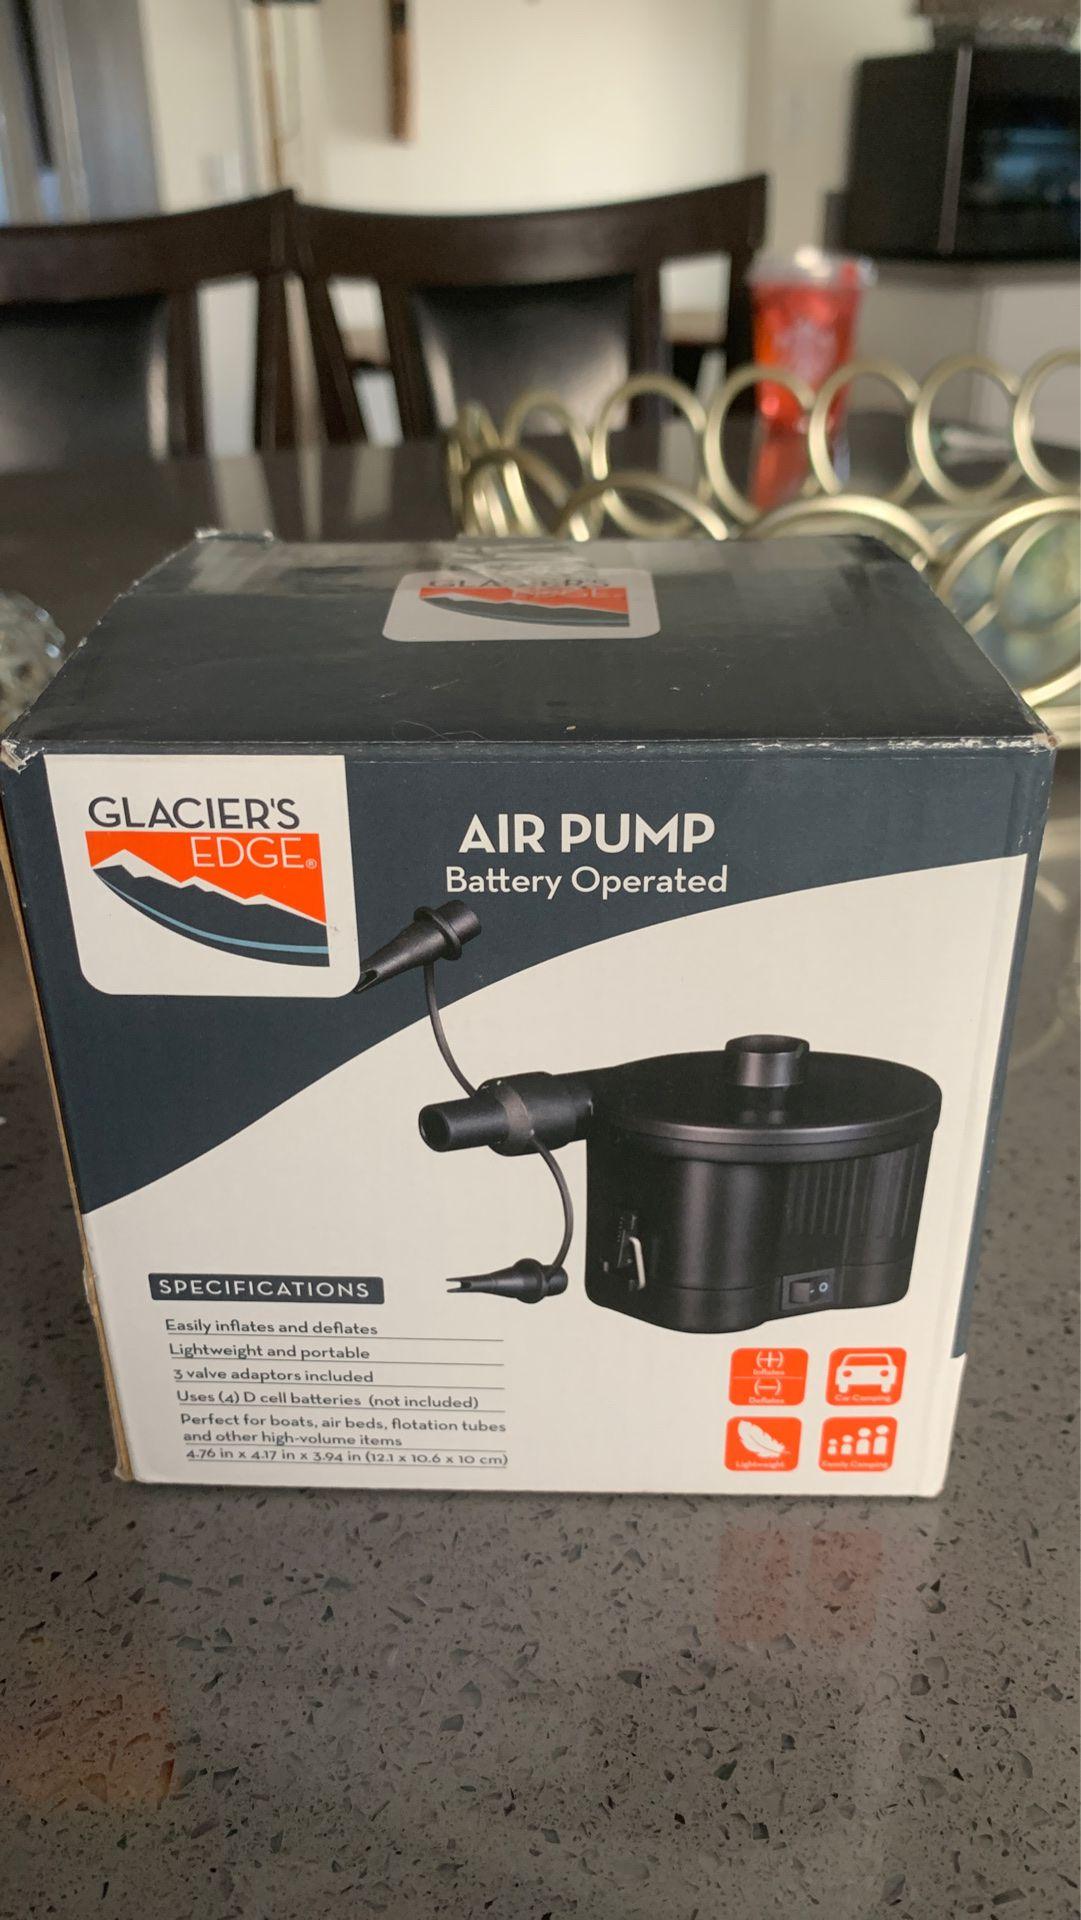 Air Pump Batter operated